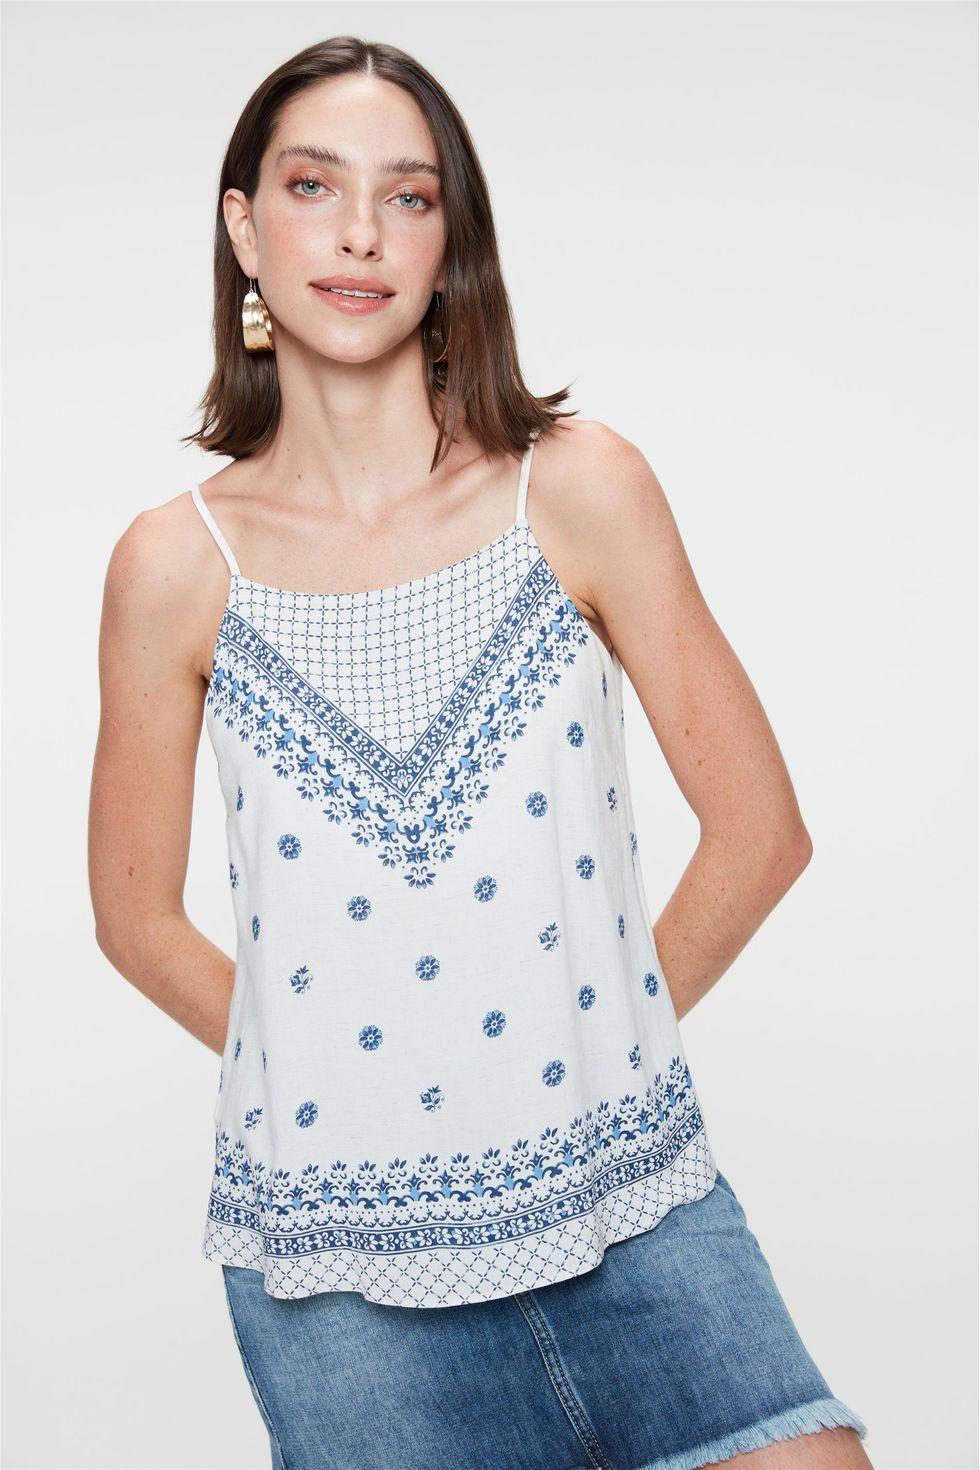 Blusa-Soltinha-de-Alca-Estampa-Floral-Frente--